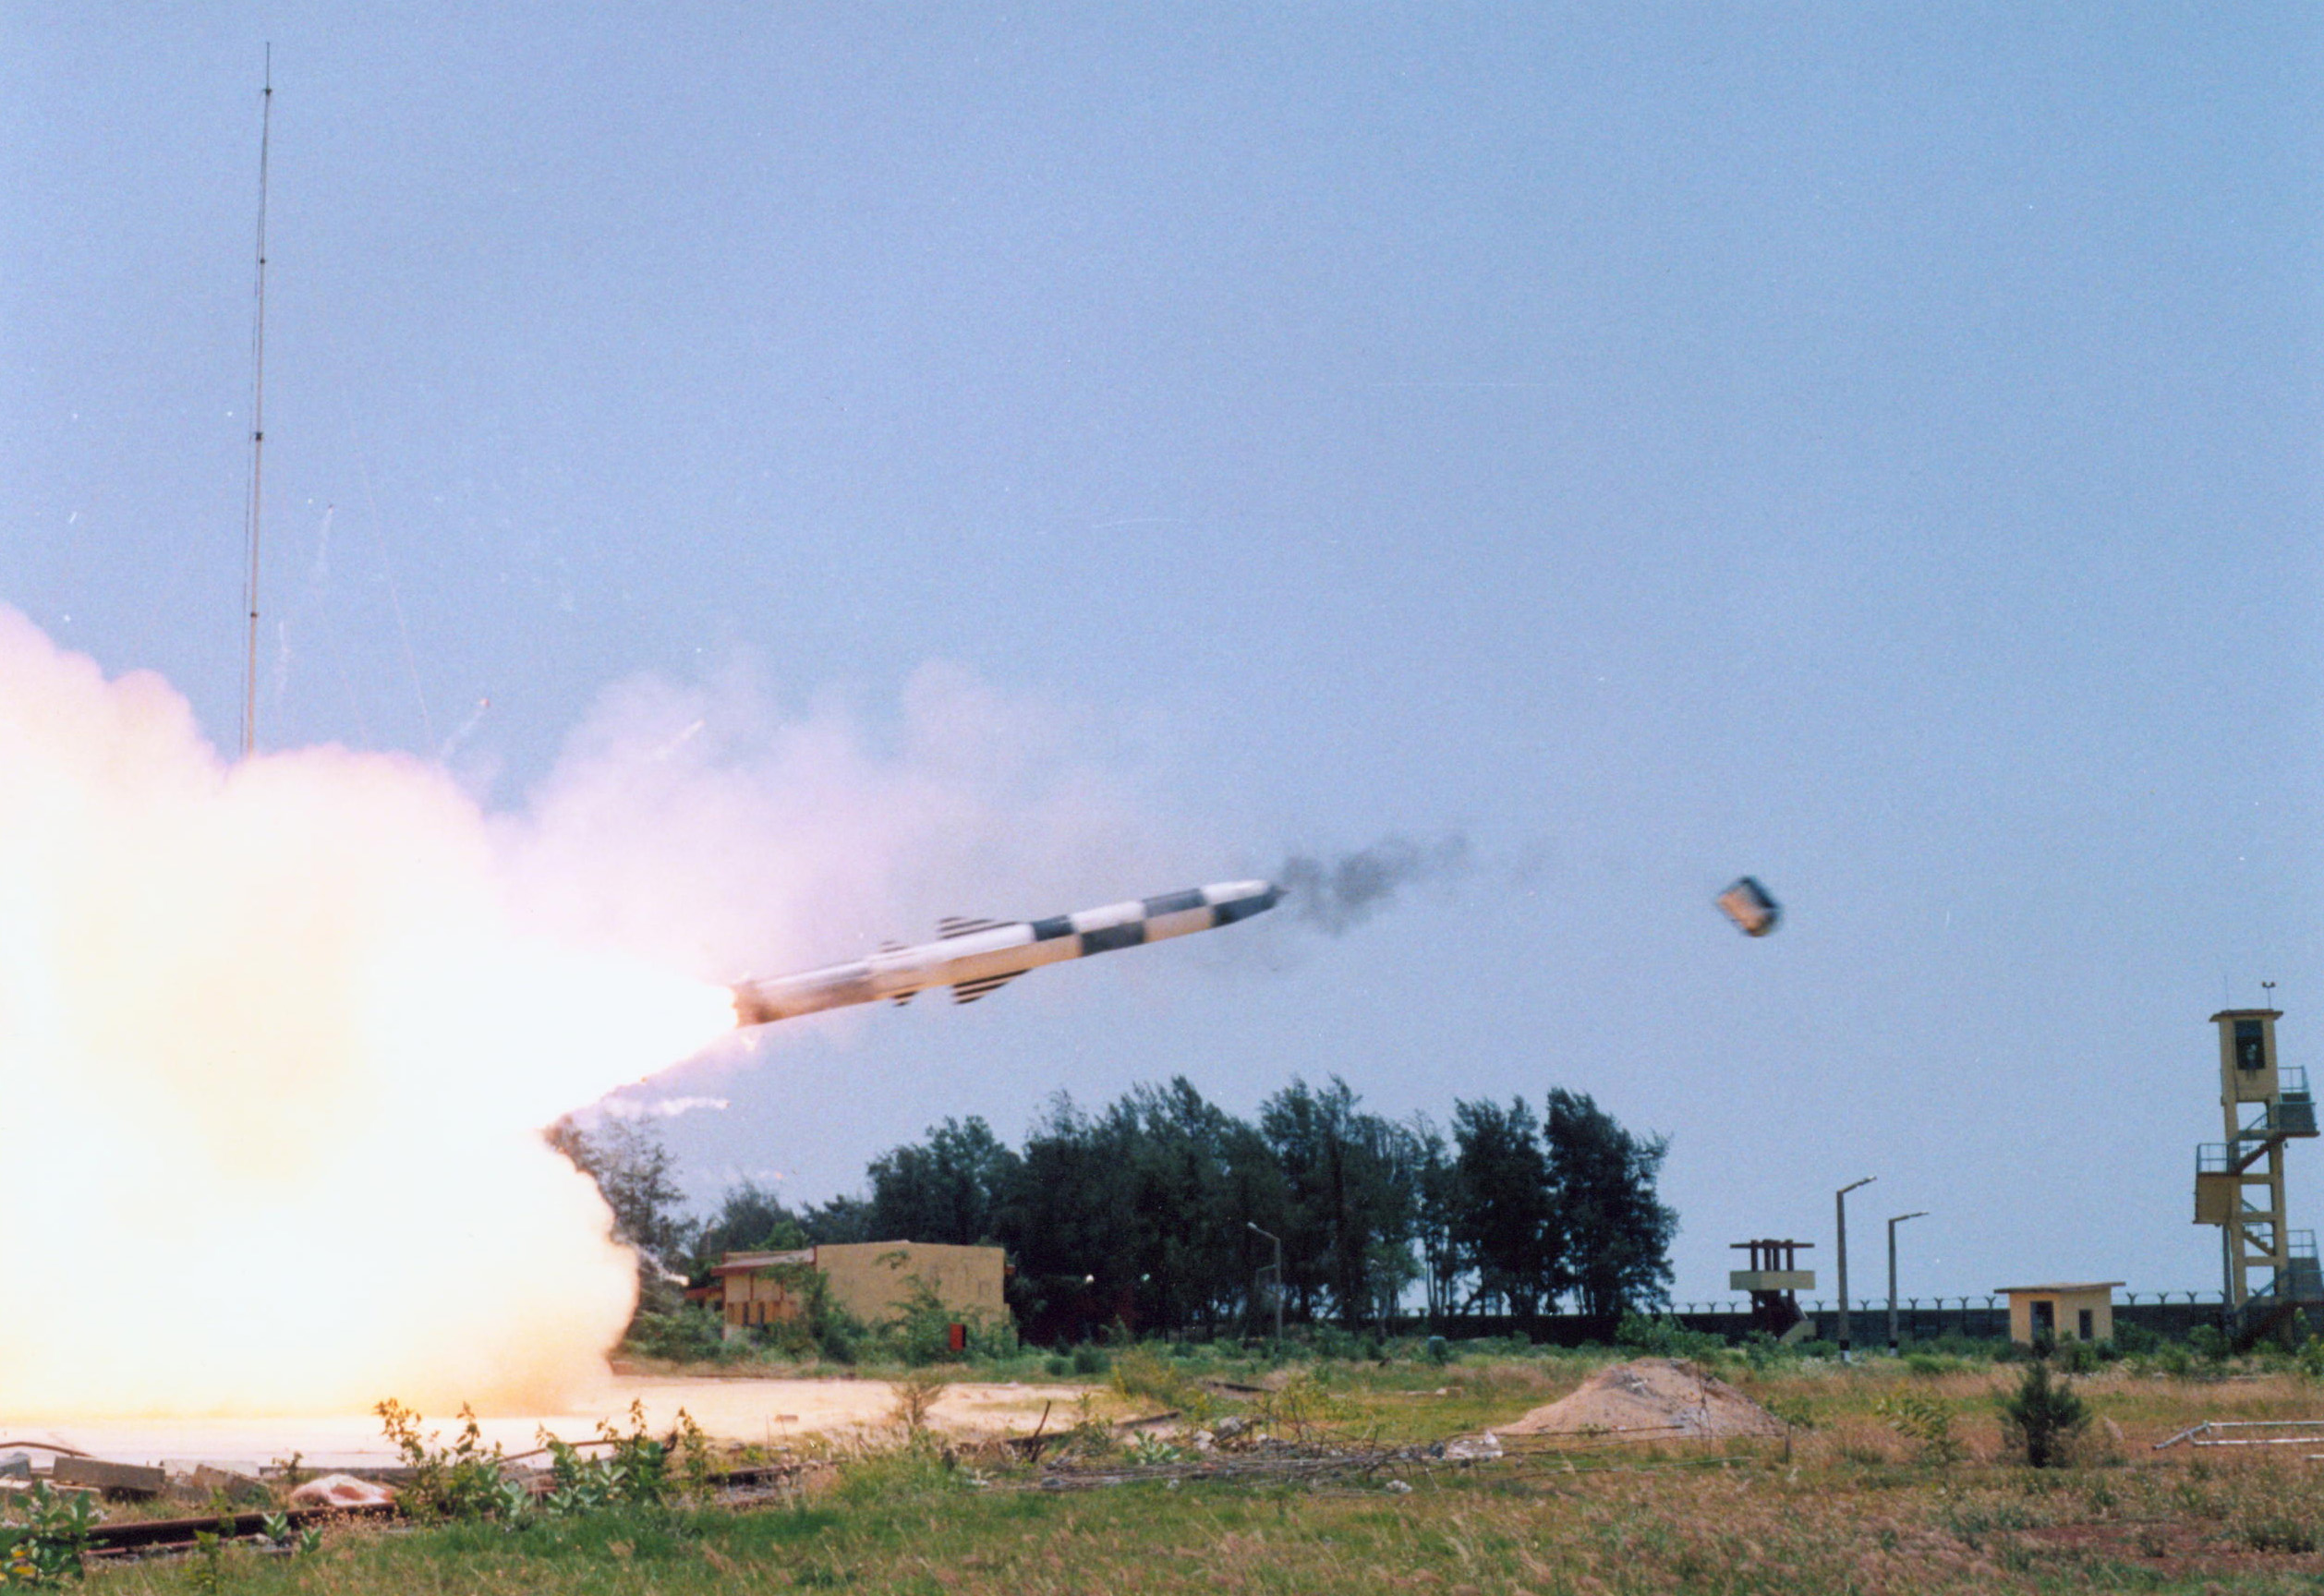 BrahMos successfully test-fired at Odisha coast